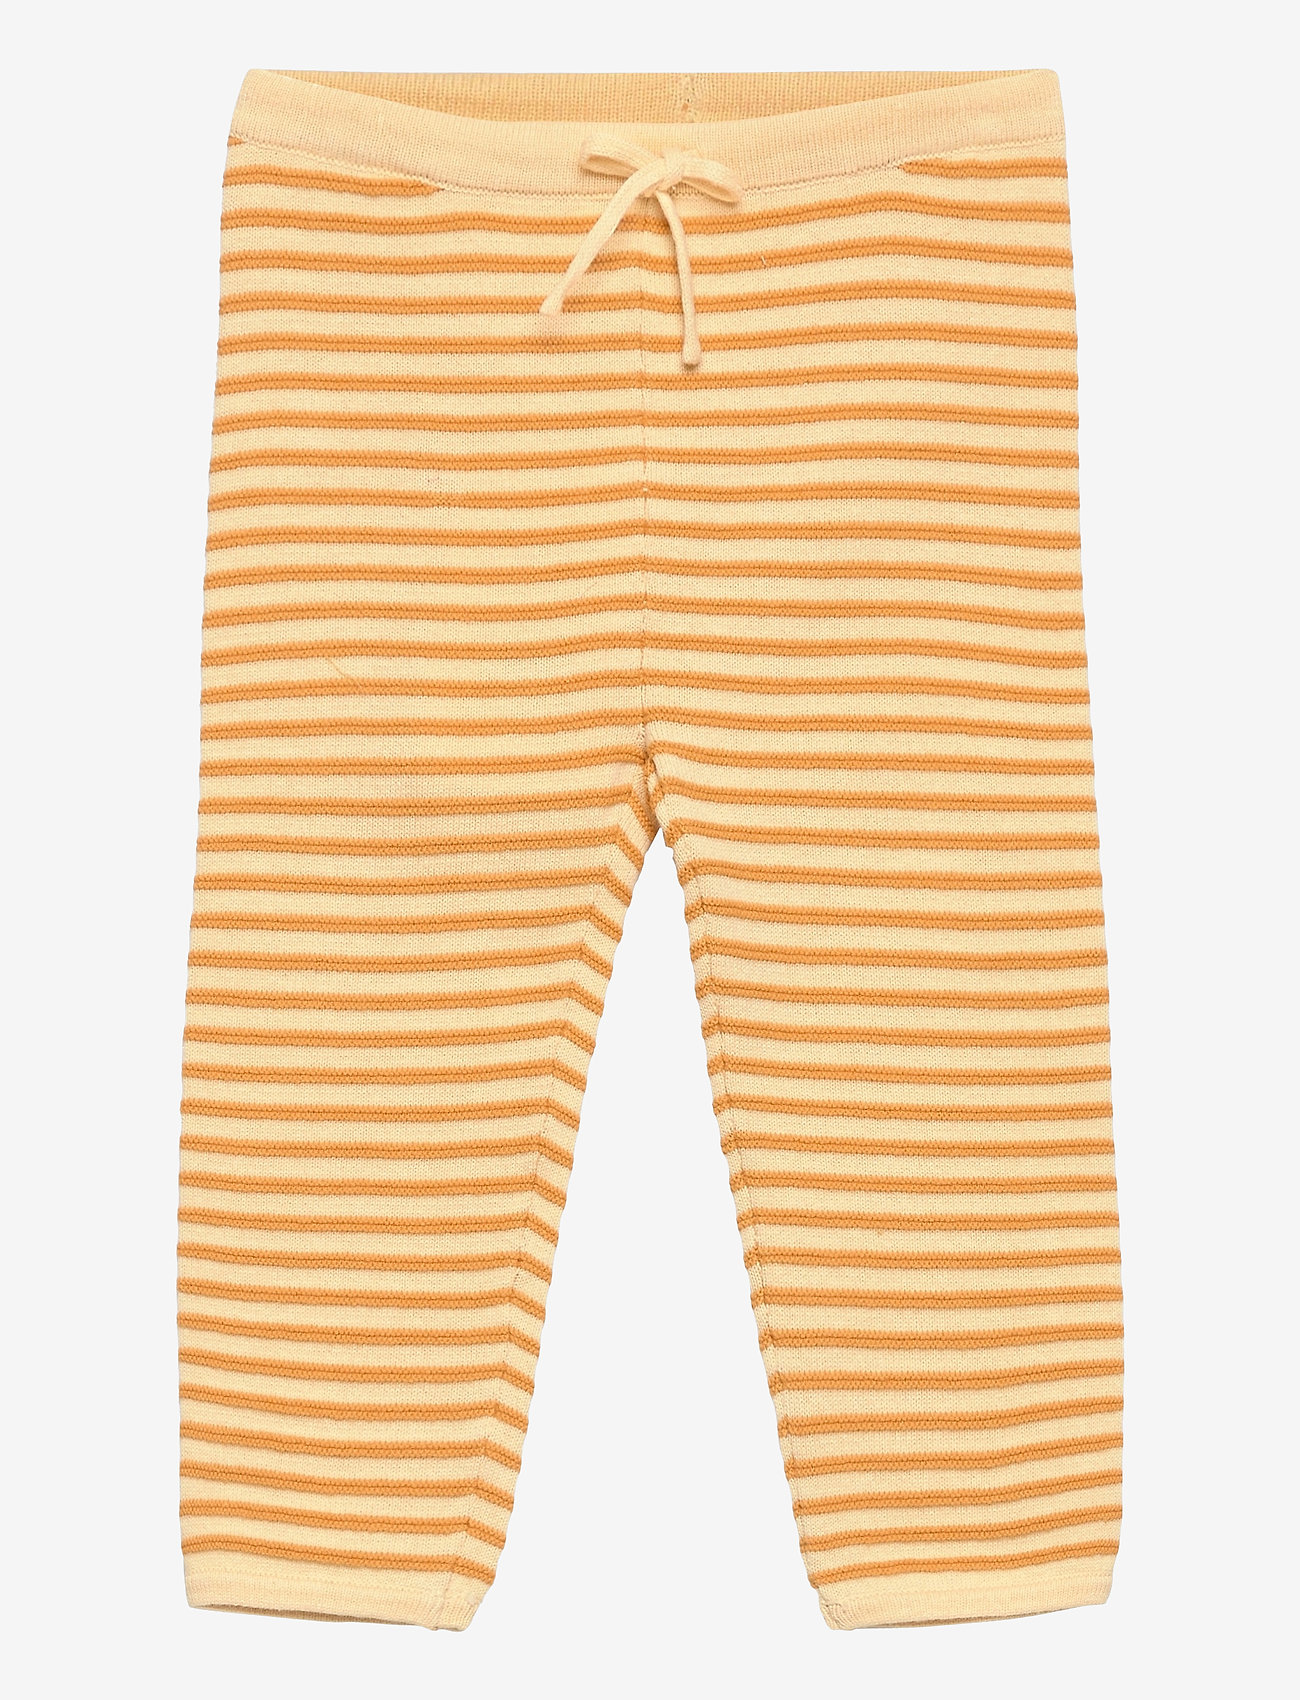 Mini A Ture - Tilda Pants, B - trousers - apricot gelato - 0